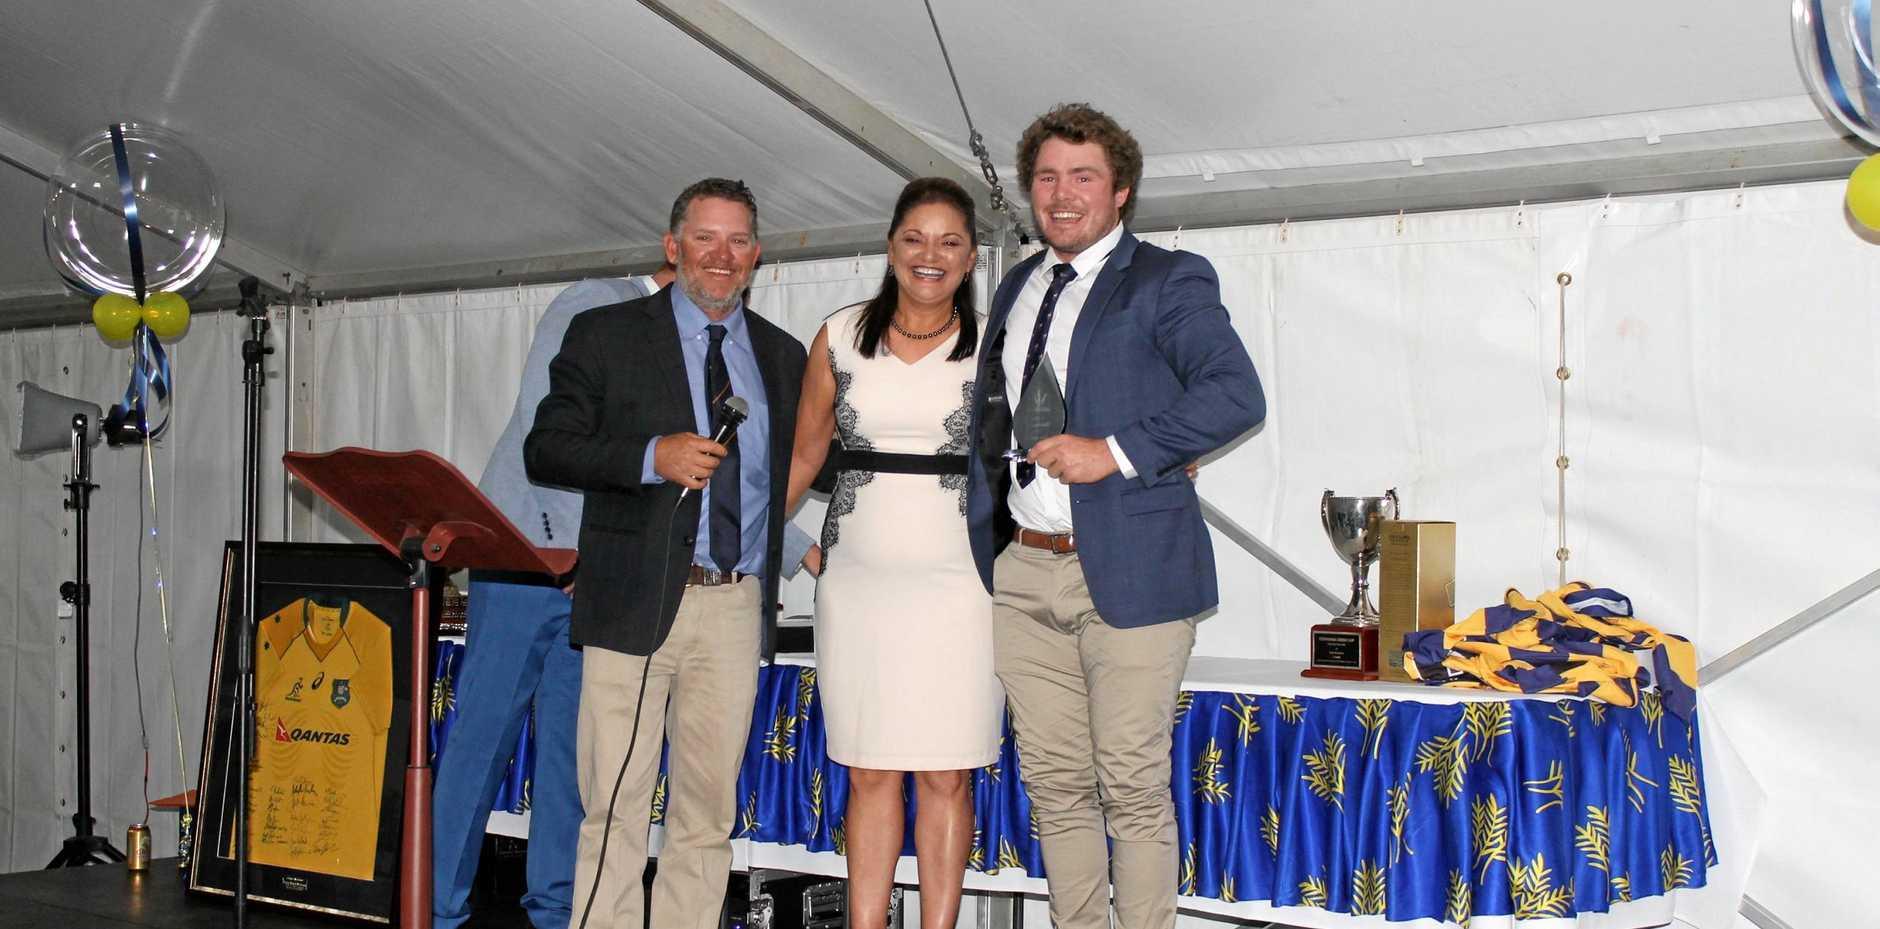 PRESENTATION: Windsor Hotel representative Michelle (centre) and Wheatmen coach Nathan Bradley present an award to Sam Hogarth.